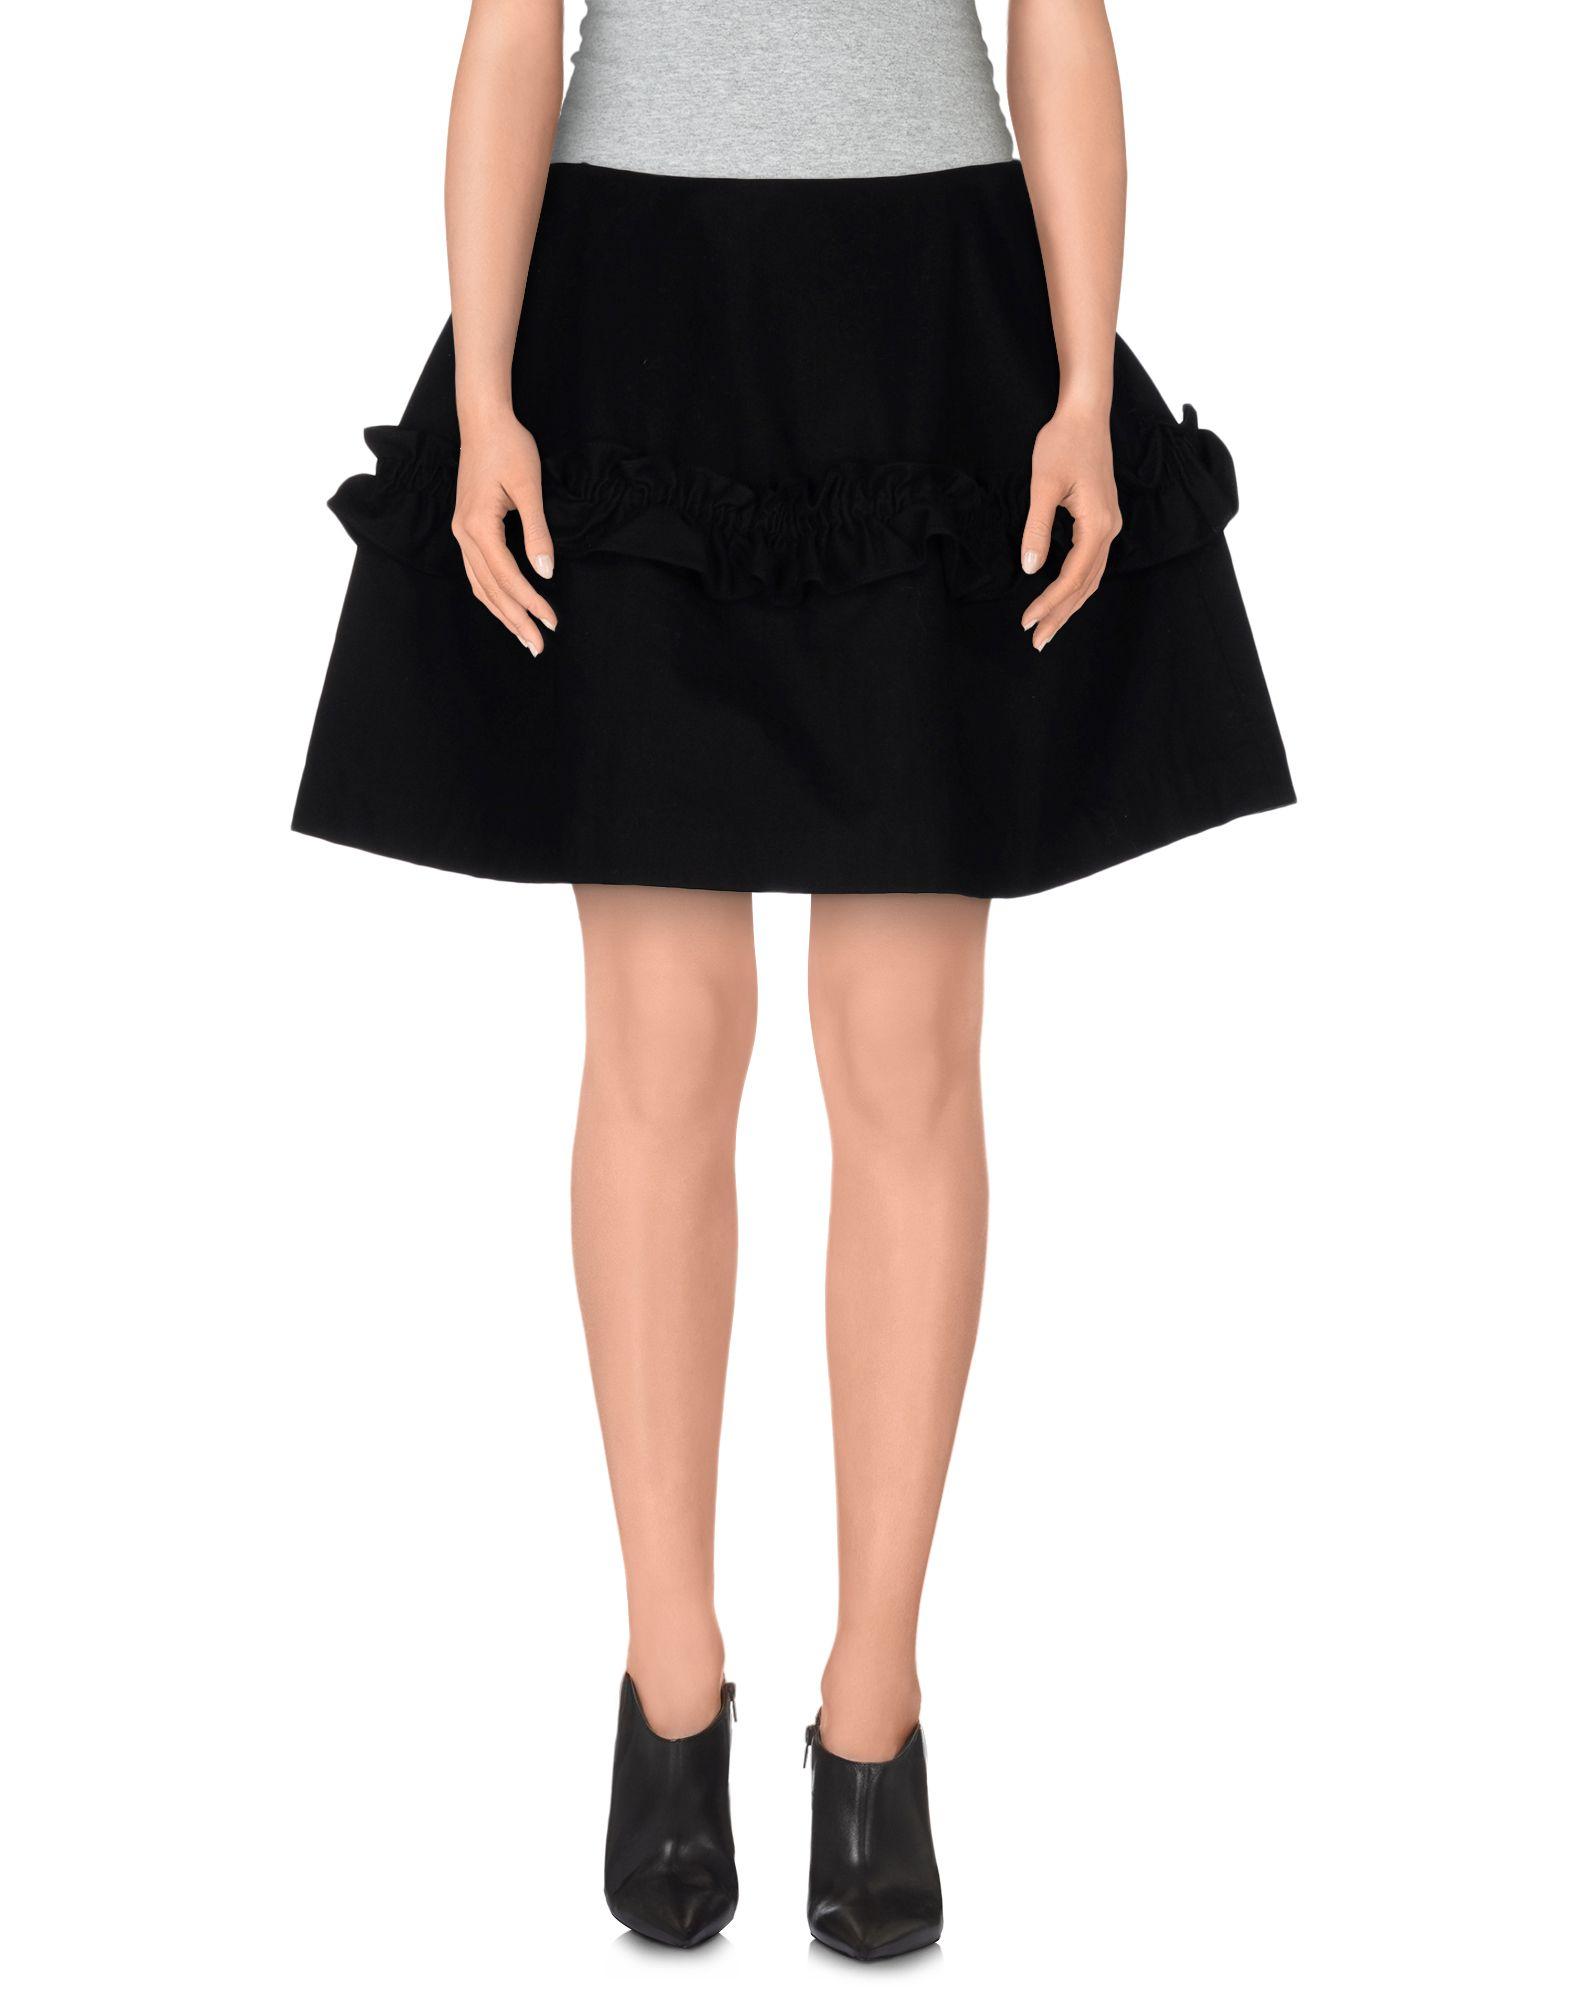 SIMONE ROCHA X J BRAND Denim Skirt in Black